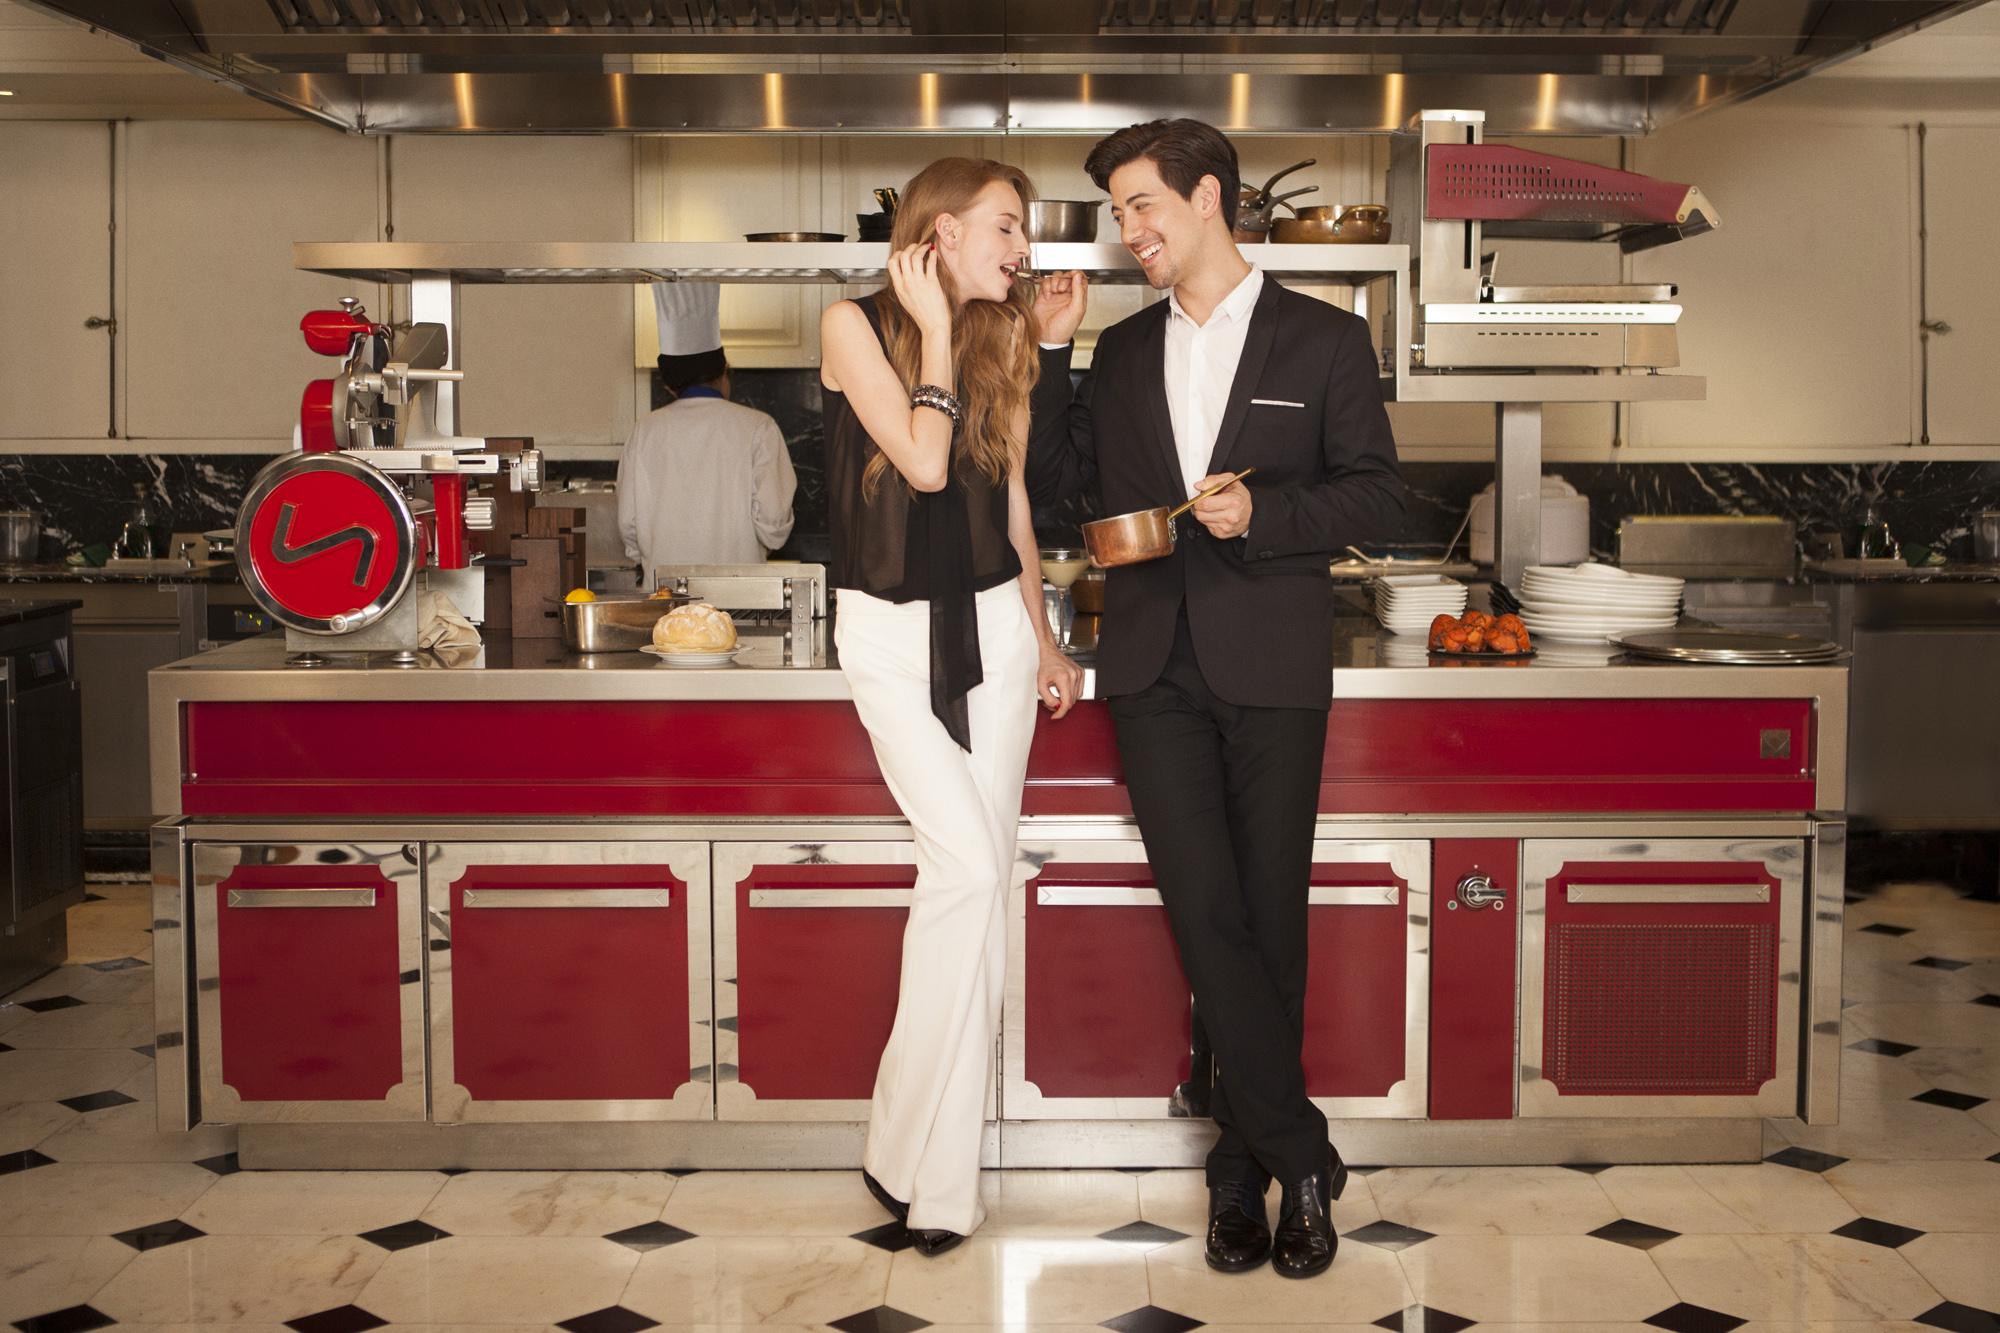 02.Valentine's Seduction Dinner at L'Appart_Sofitel ...